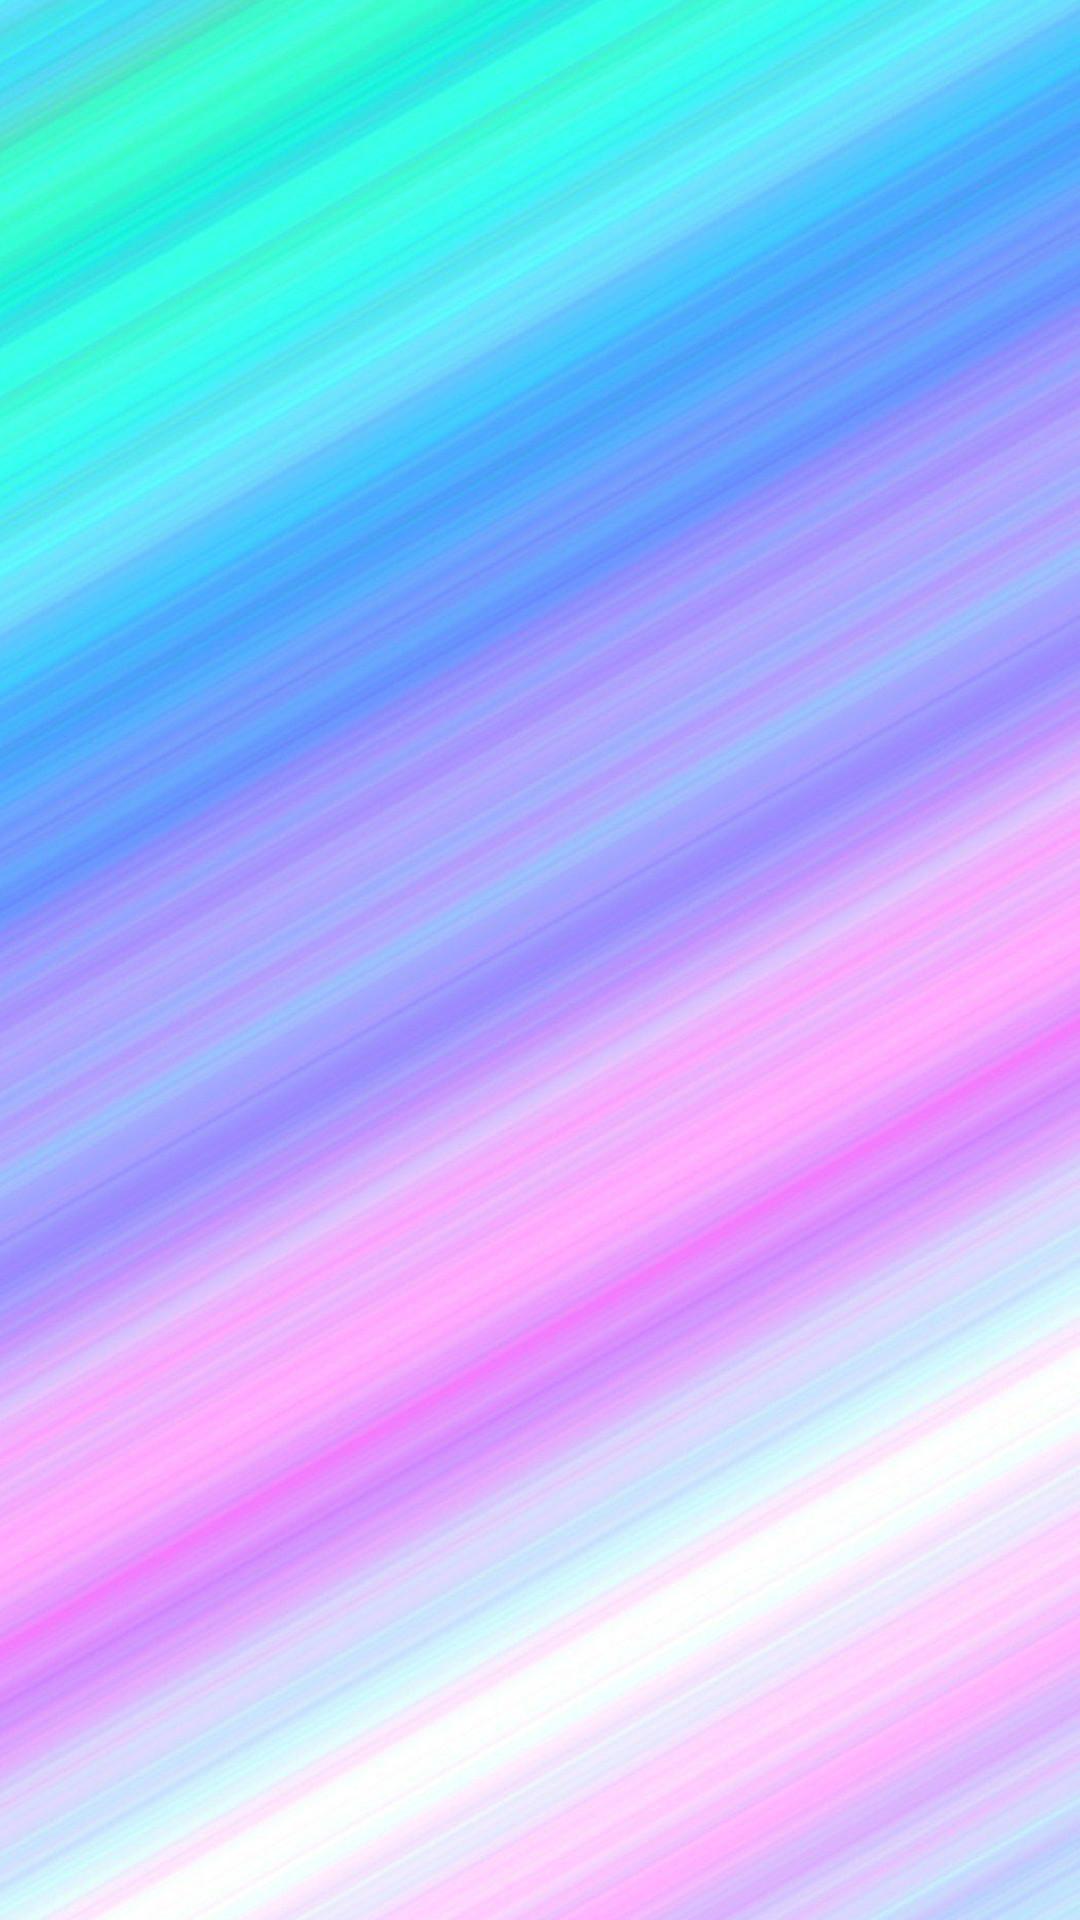 High resolution wallpaper background ID 77701921262